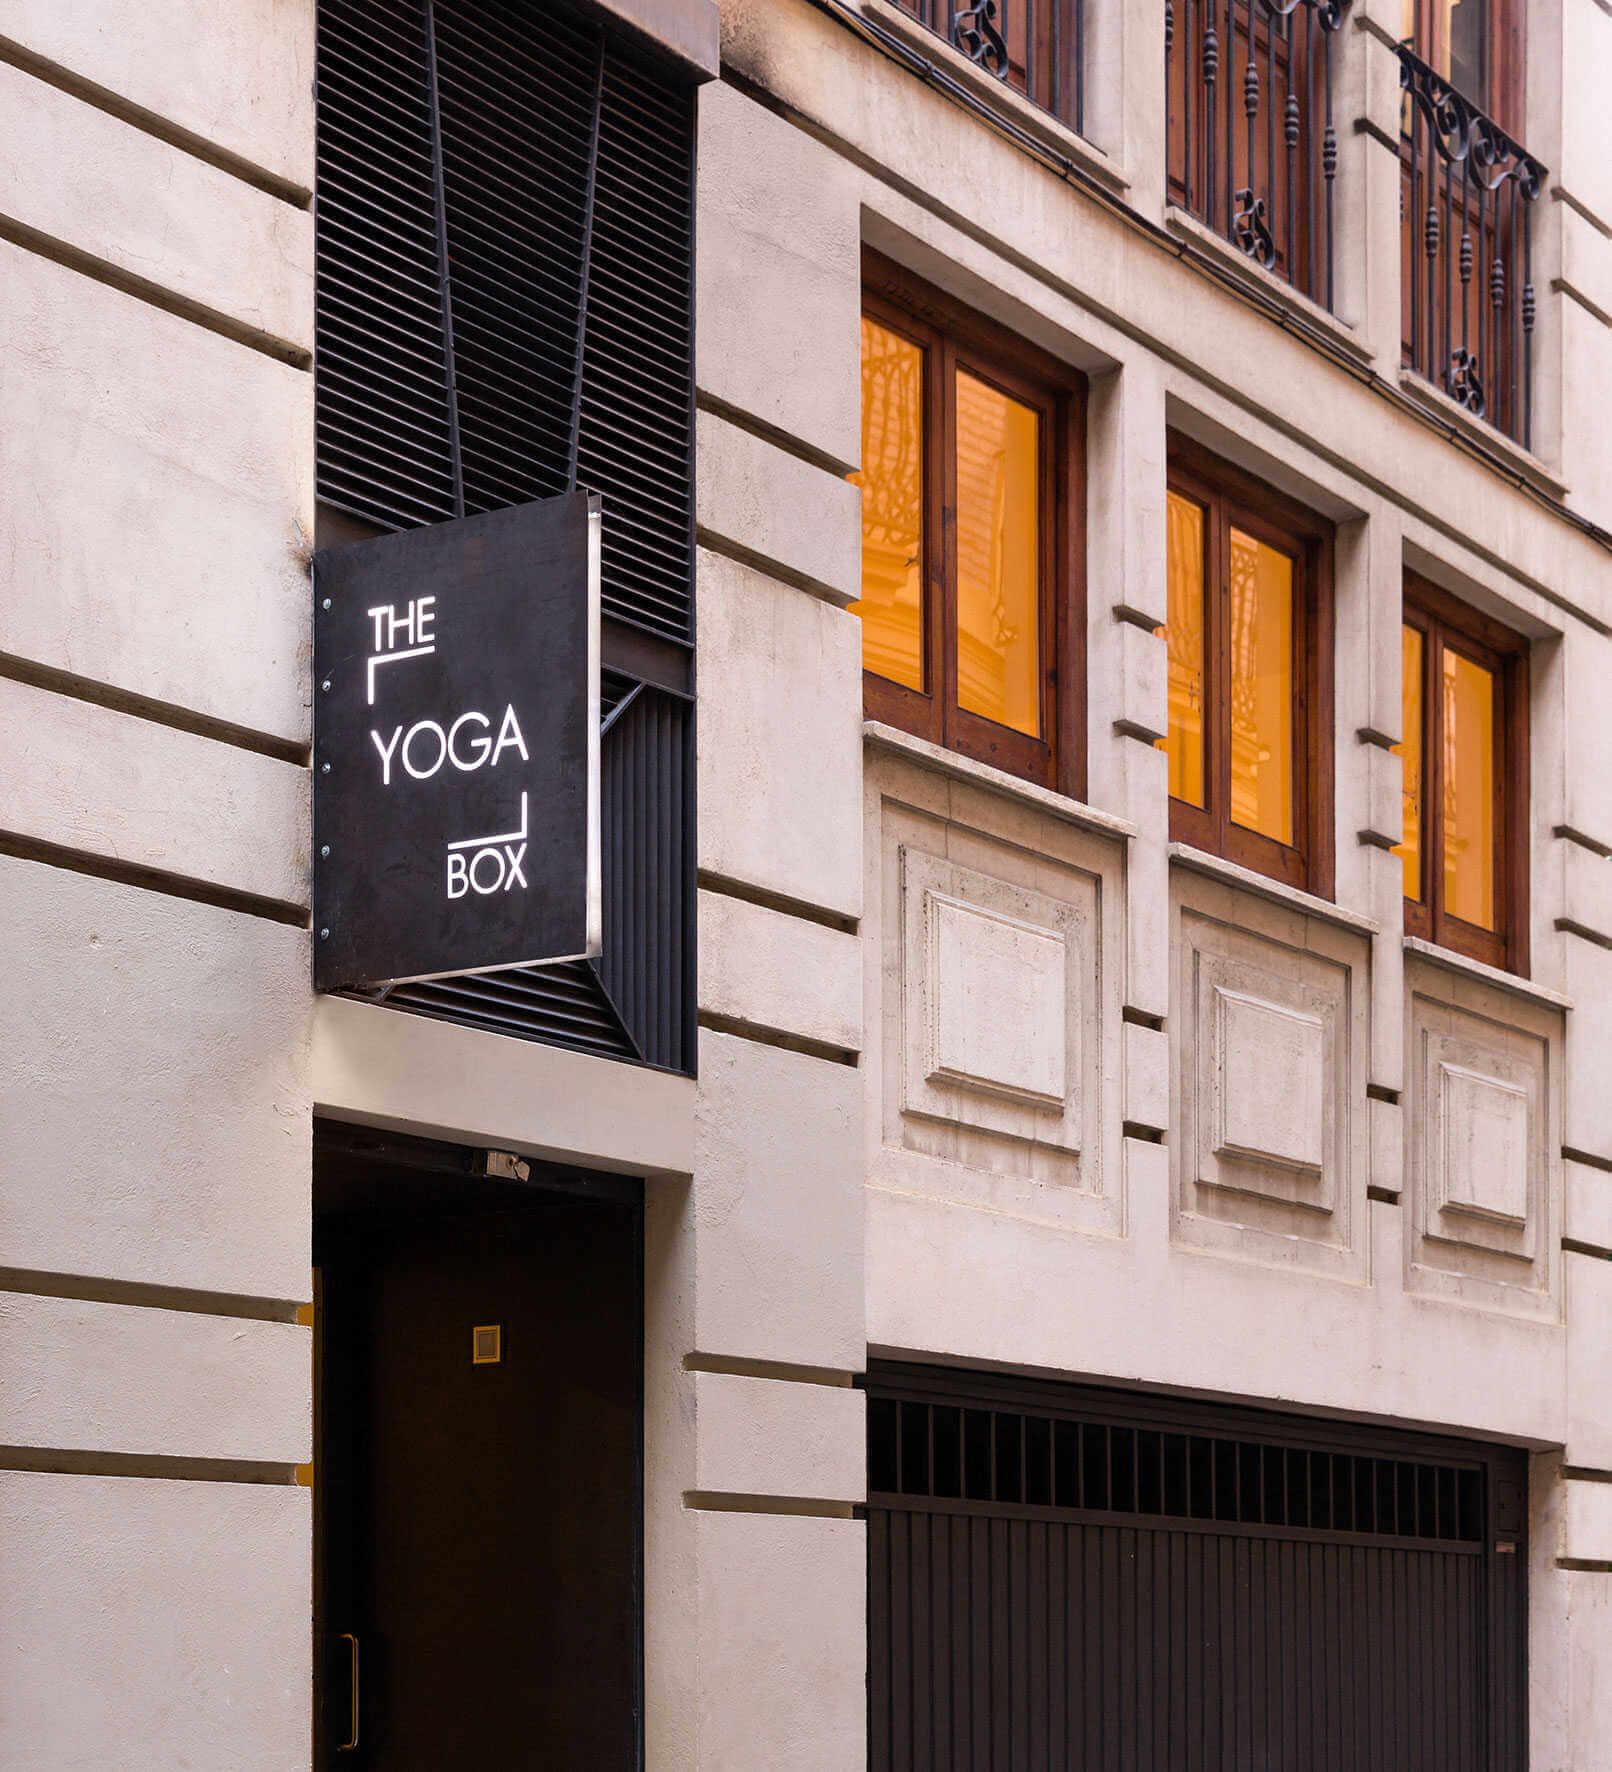 Daniel Rueda Homu Arquitectos The Yoga Box 53 | The Yoga Box, Valencia